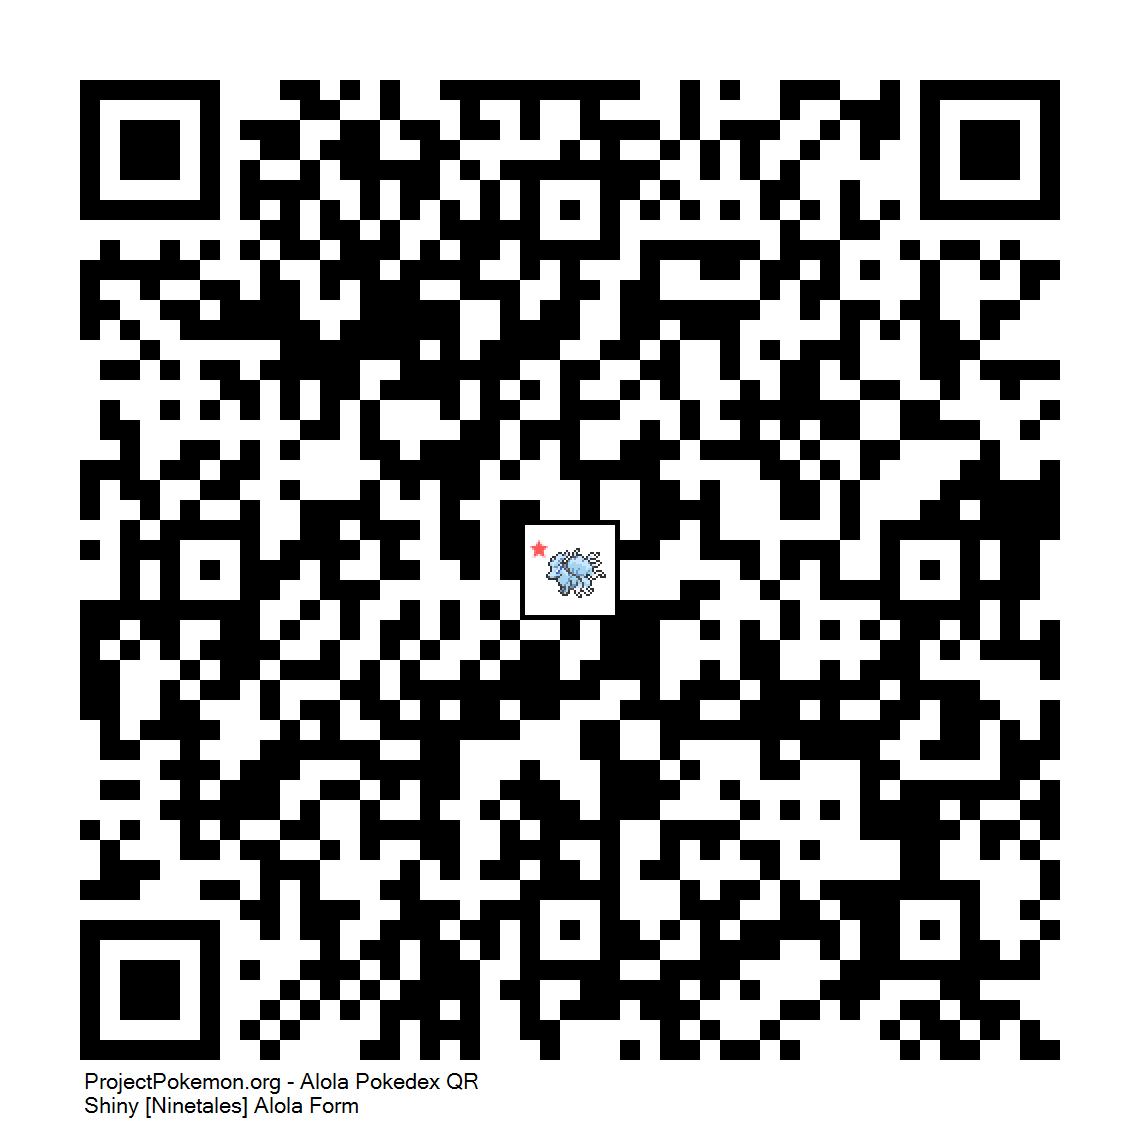 038 - Shiny [Ninetales] Alola Form png - Generation 7 - QR Codes